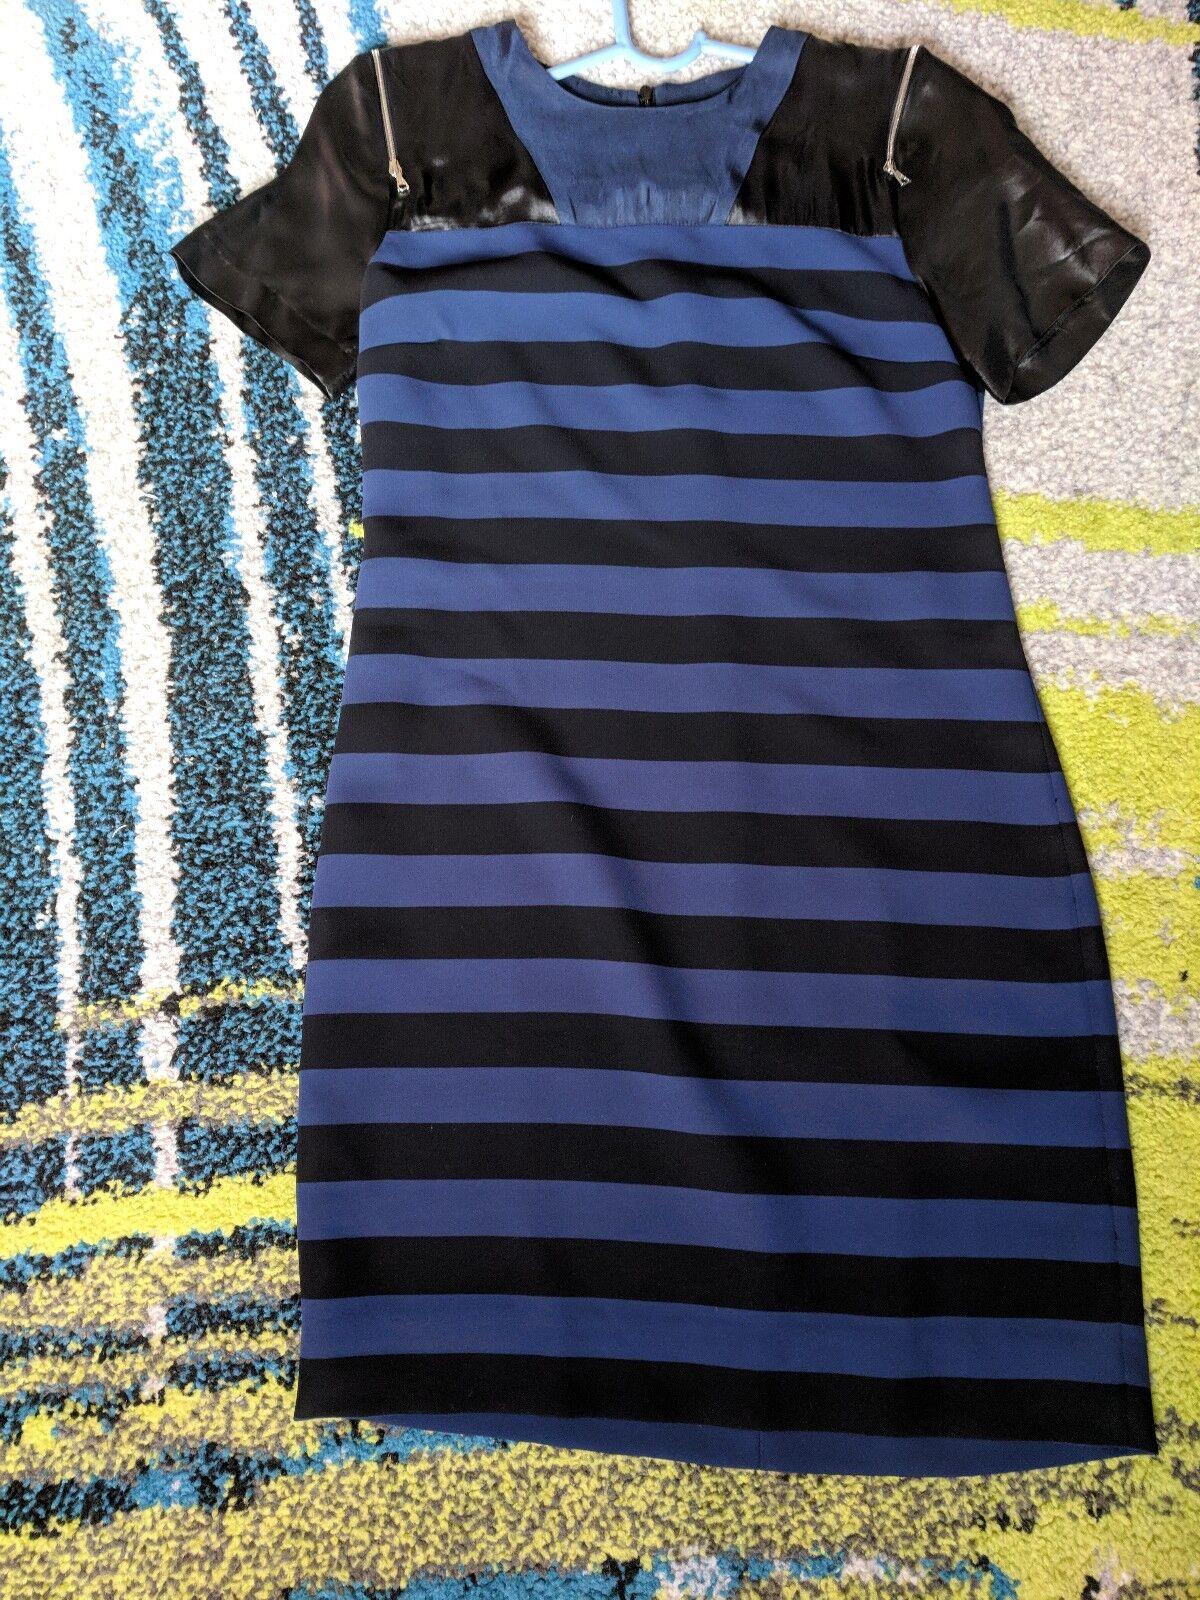 Sandro schwarz and navy stripe dress